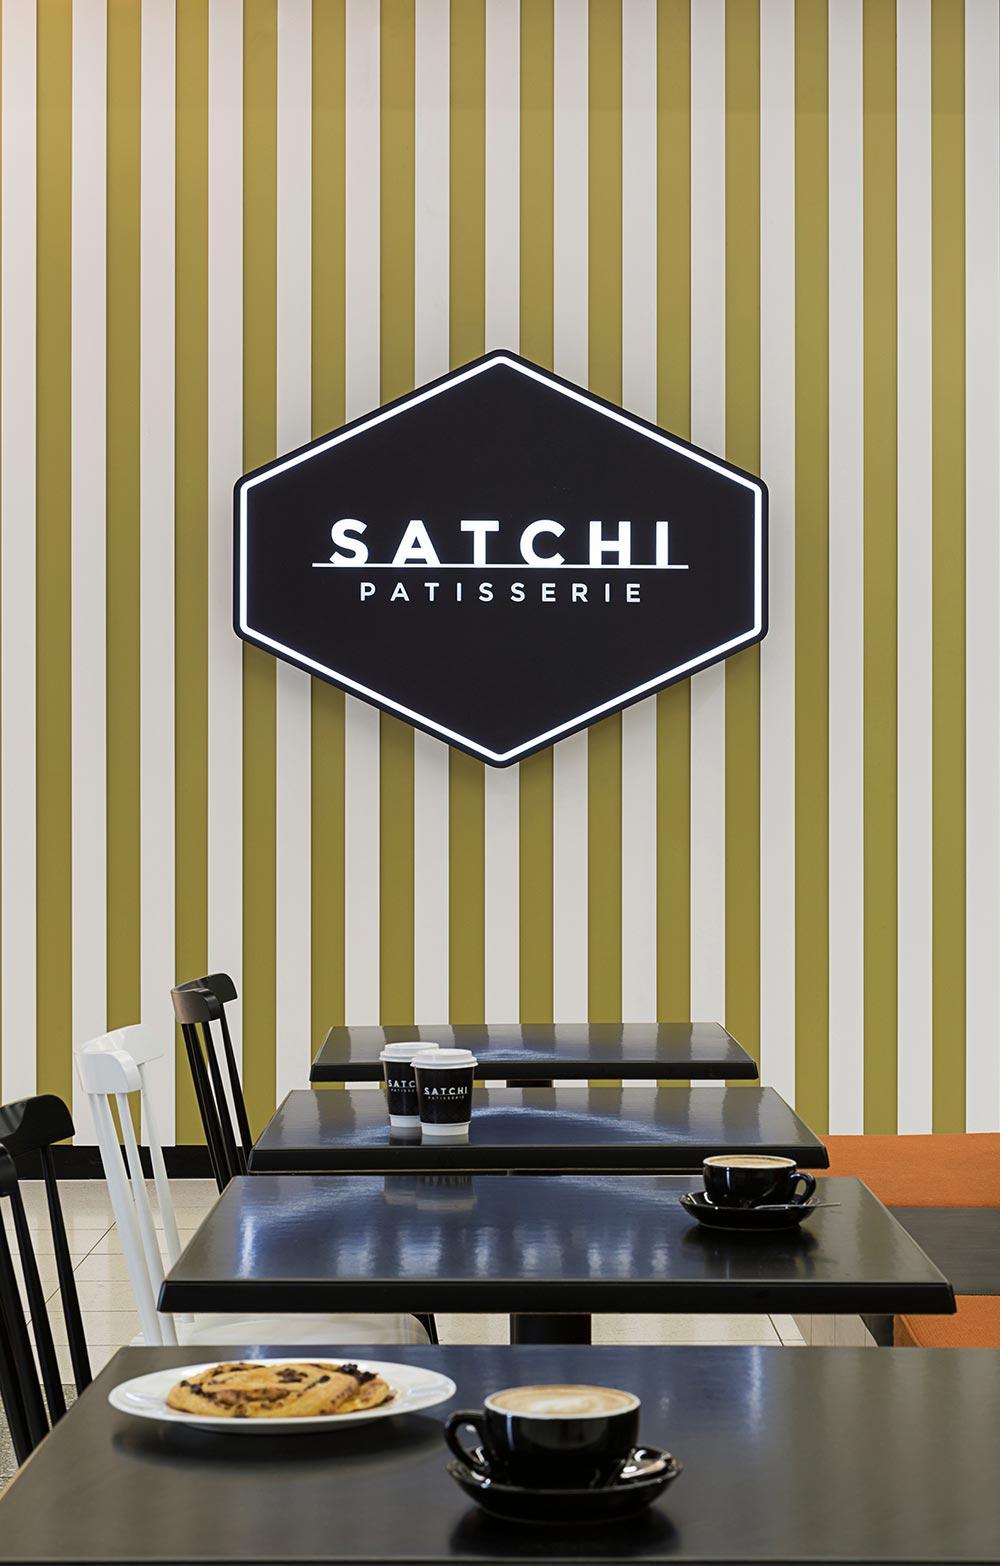 Satchi-Brimbank-Cafe-Patisserie-04.jpg